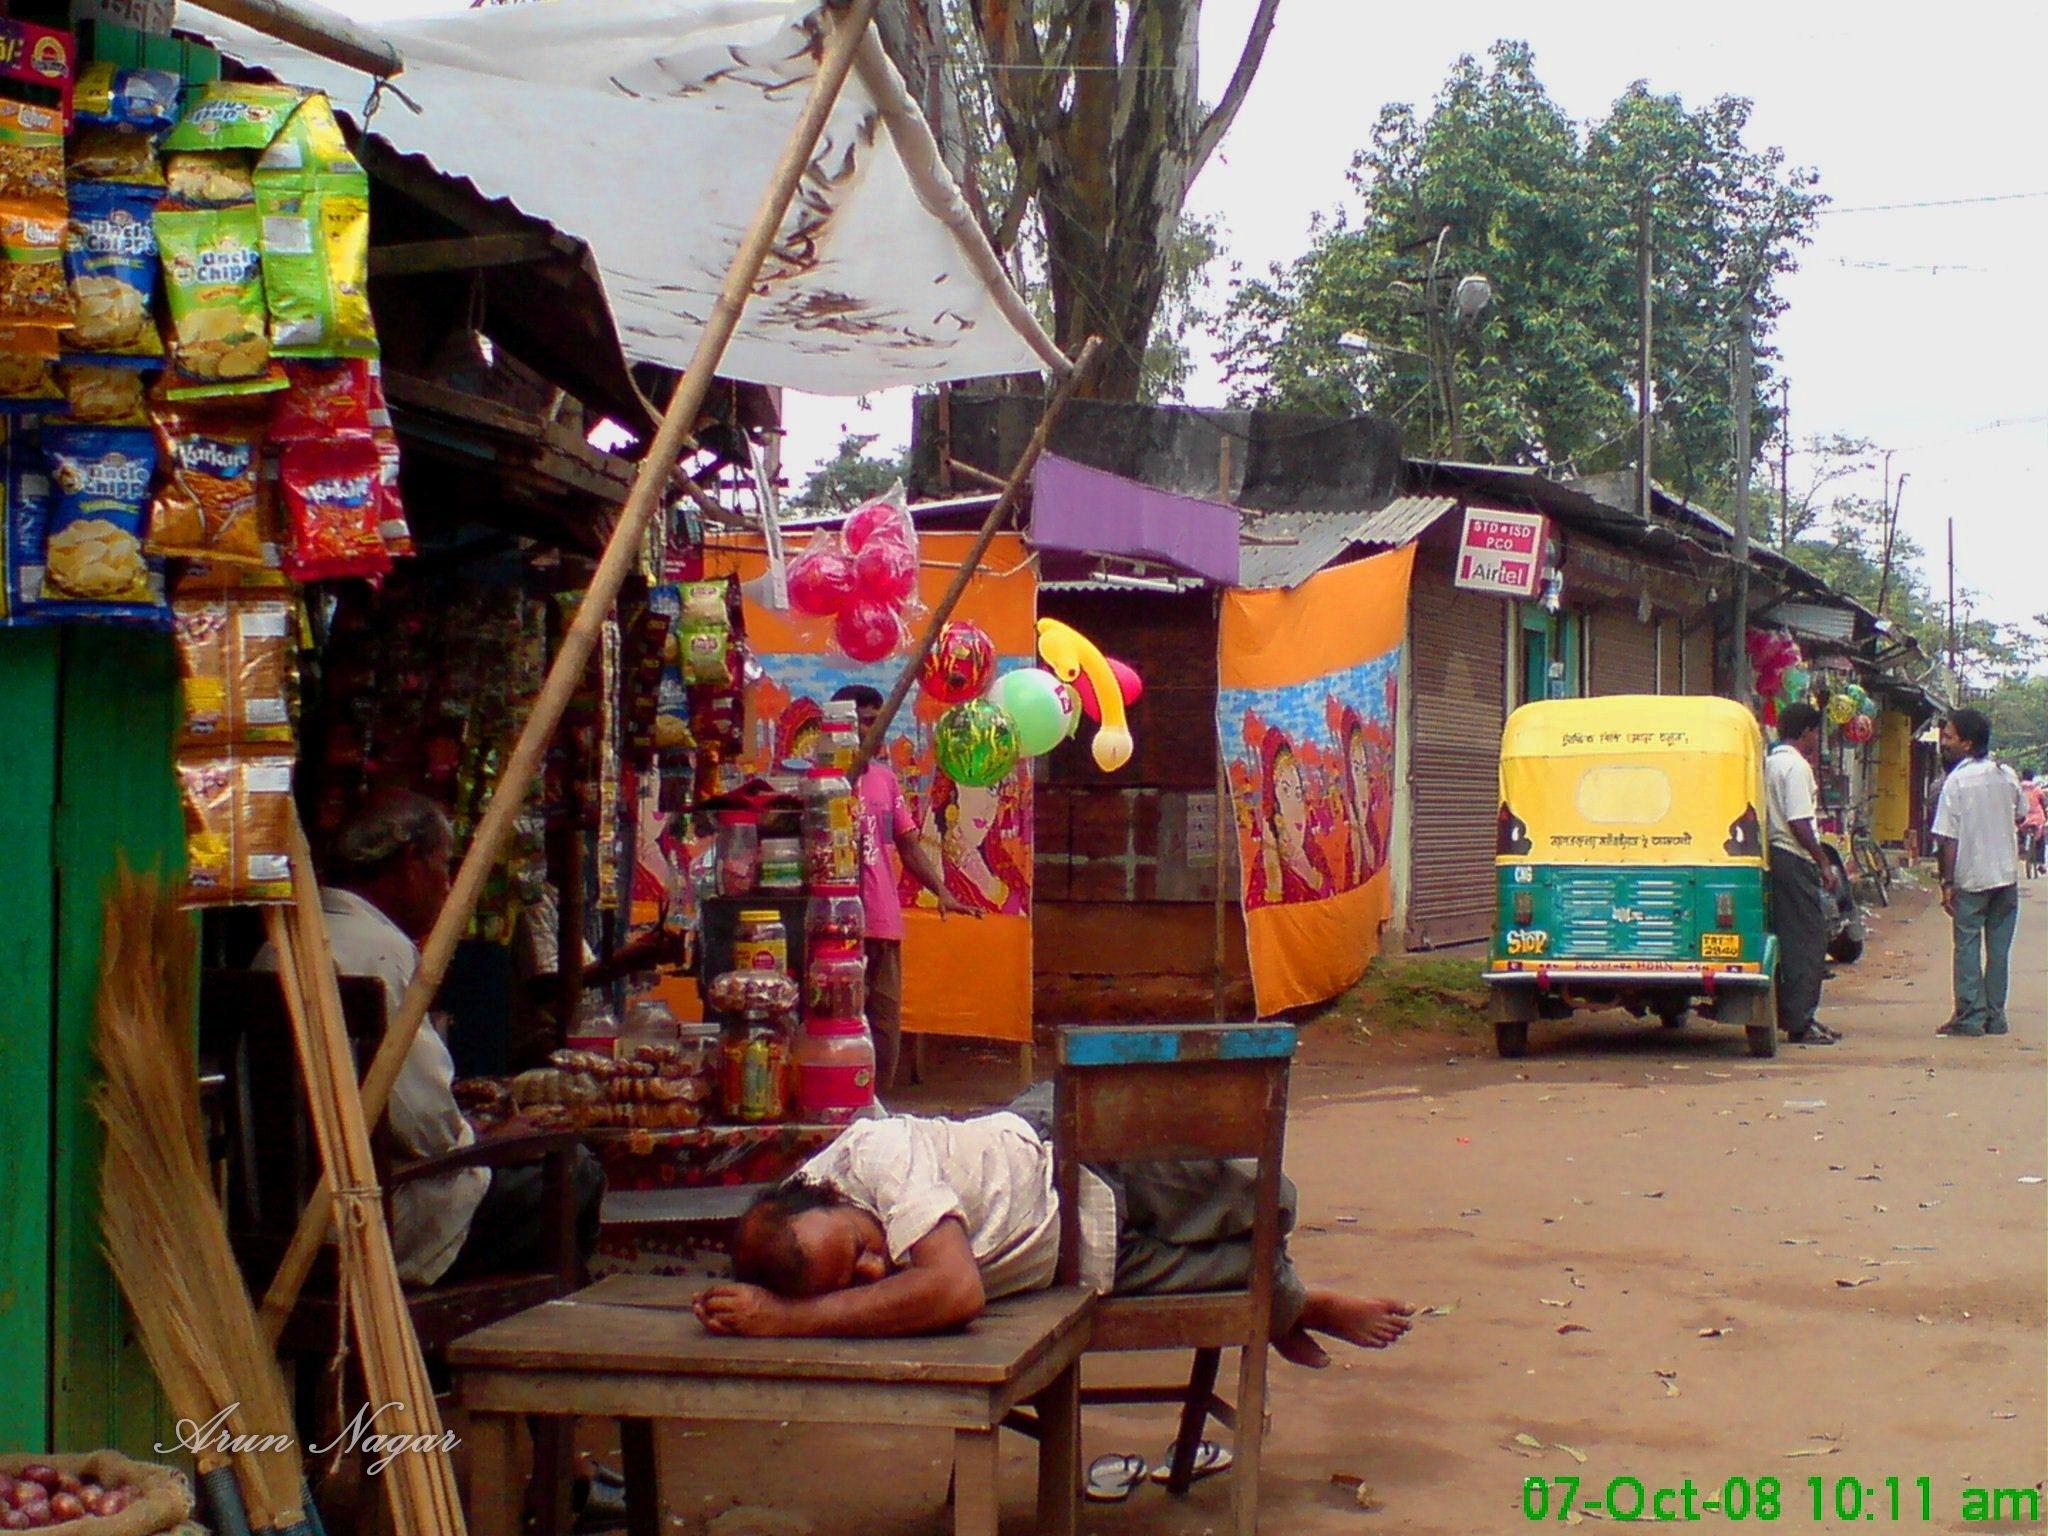 Morning of a remote village by Arun Nagar